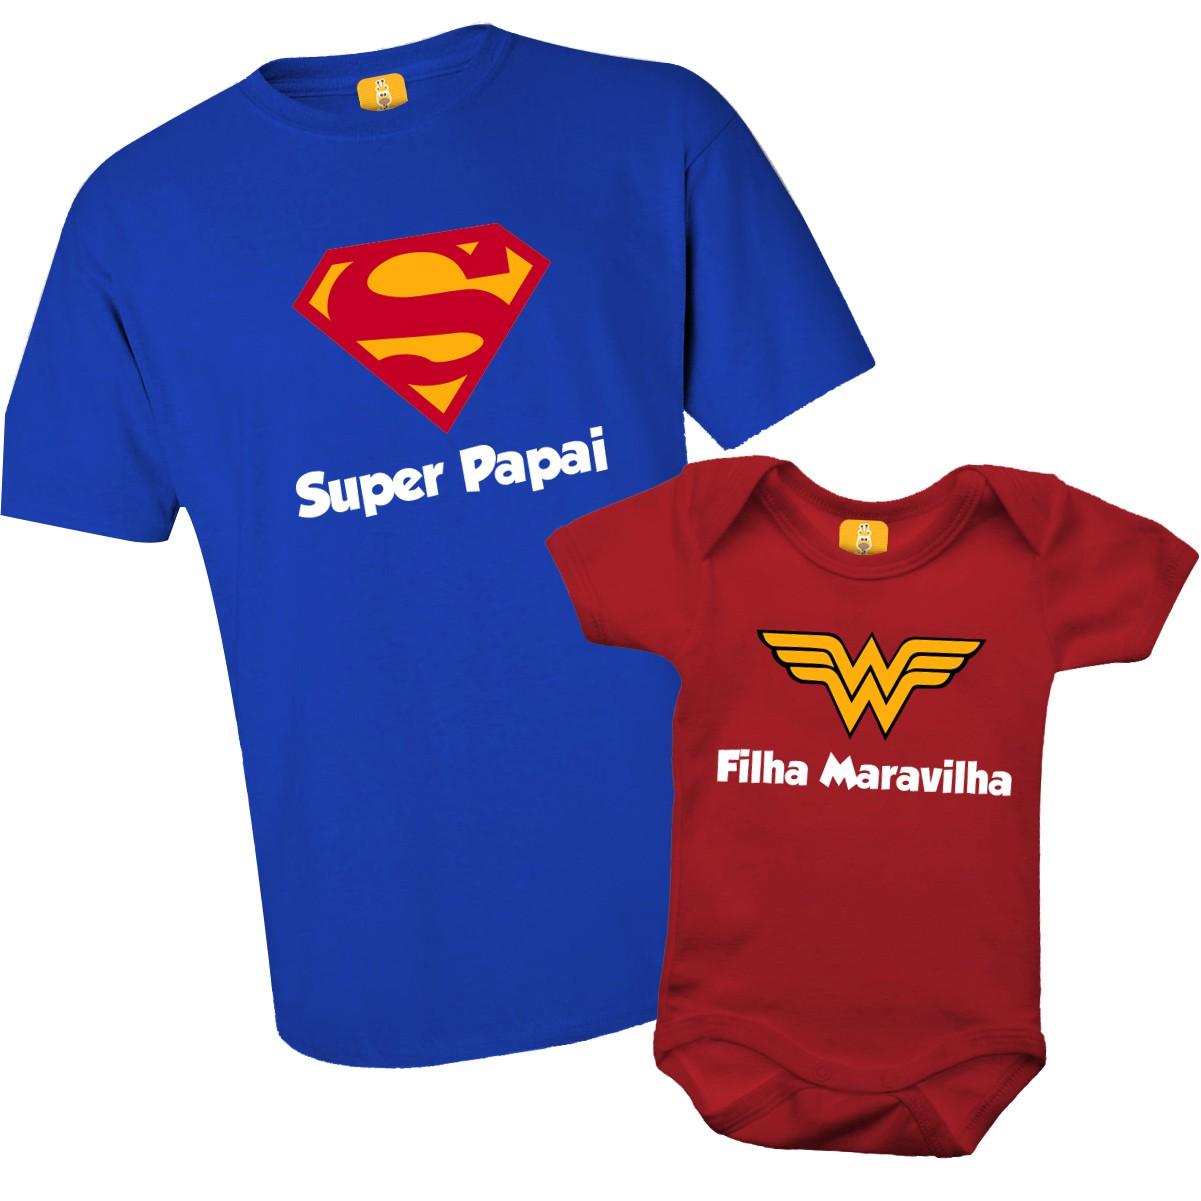 Kit camiseta e body - Super Pai e Filha Maravilha